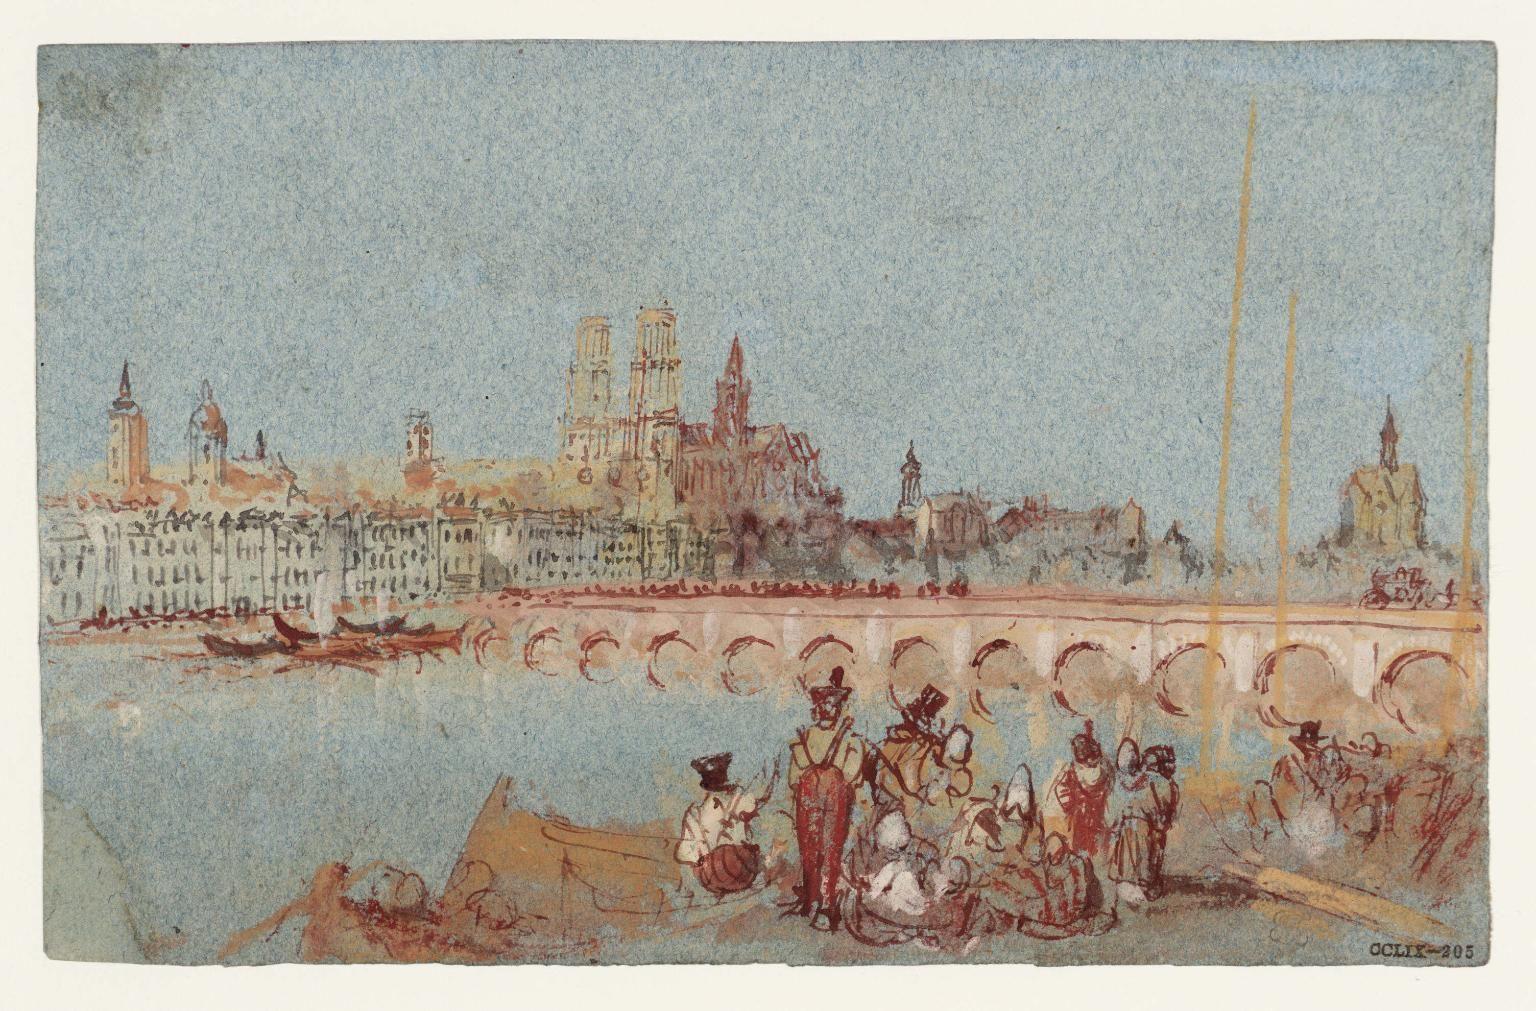 Joseph Mallord William Turner, 'Orléans, Loire Valley' c.1826–8